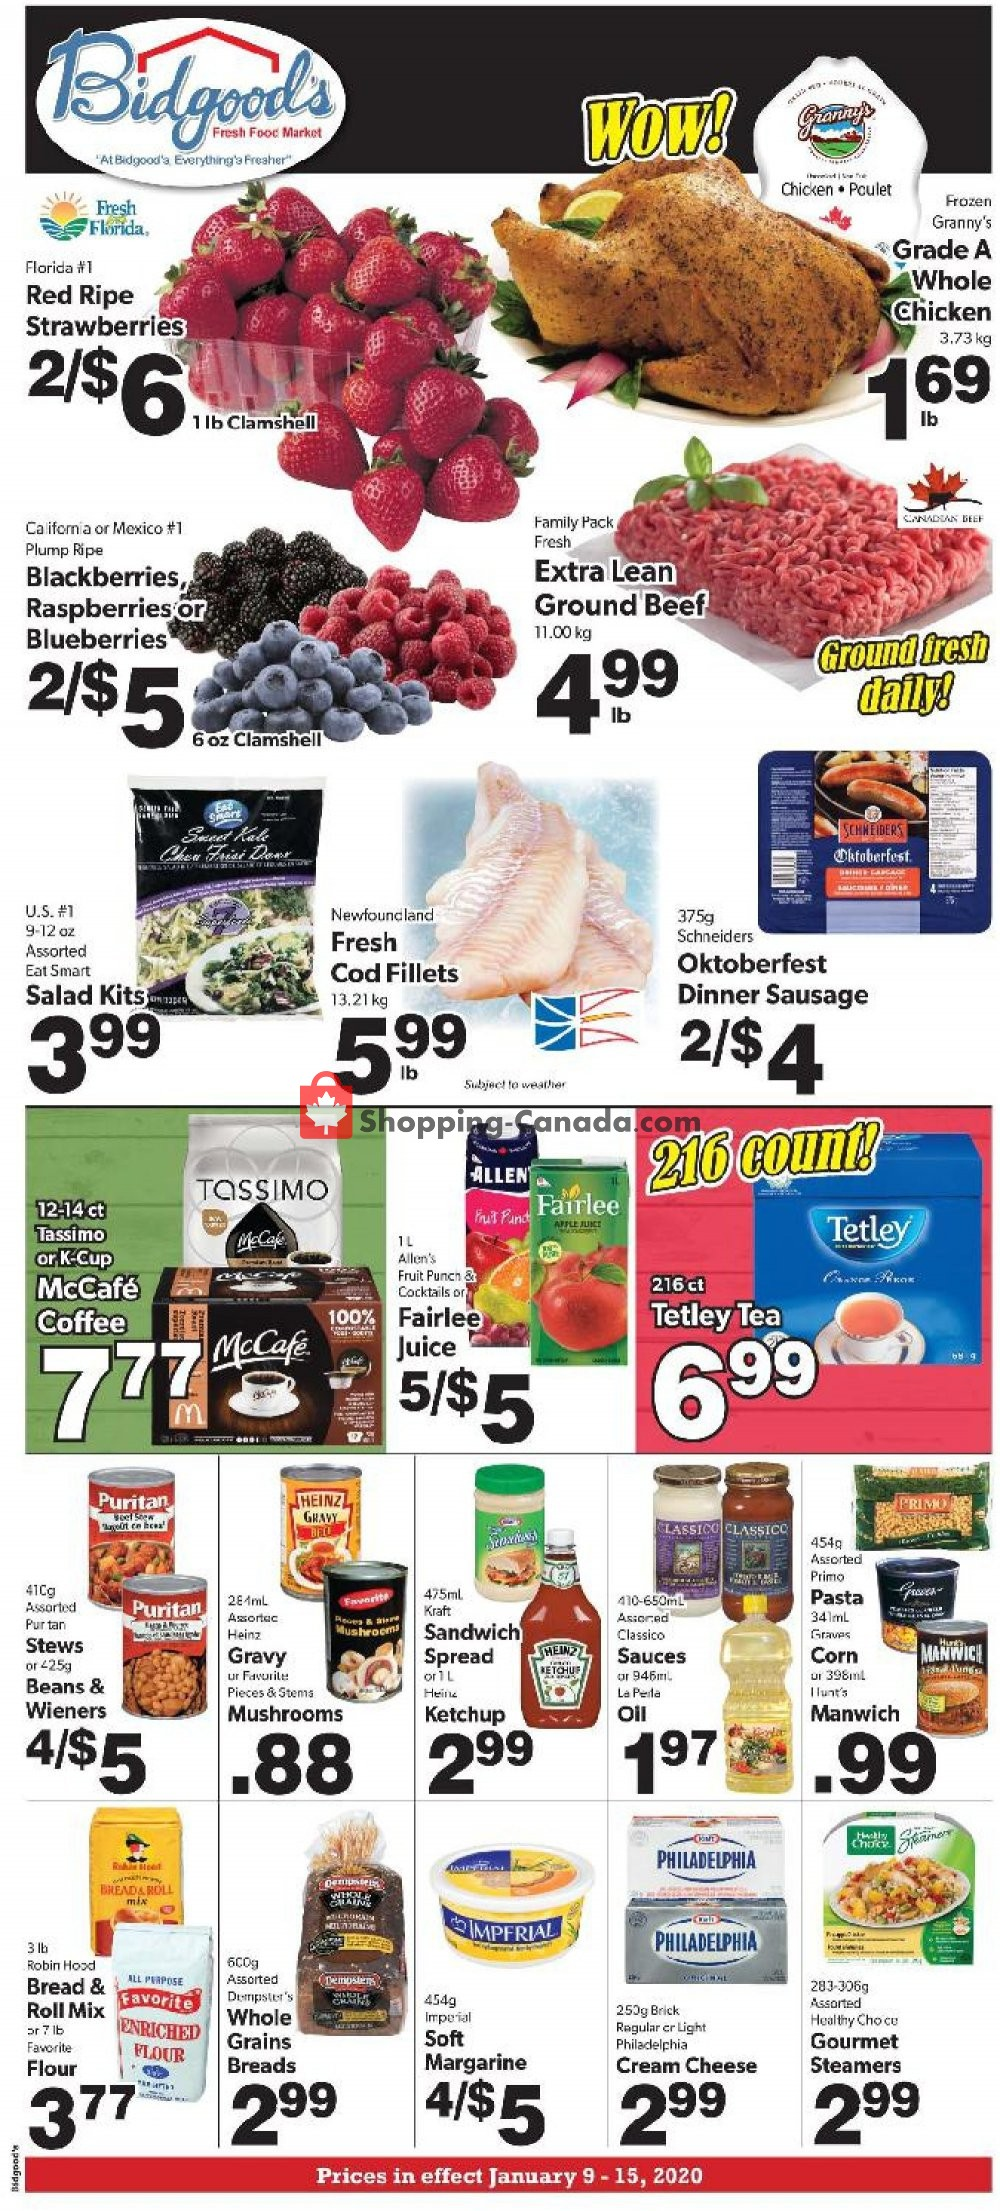 Flyer Bidgood's Supermarket Canada - from Thursday January 9, 2020 to Wednesday January 15, 2020